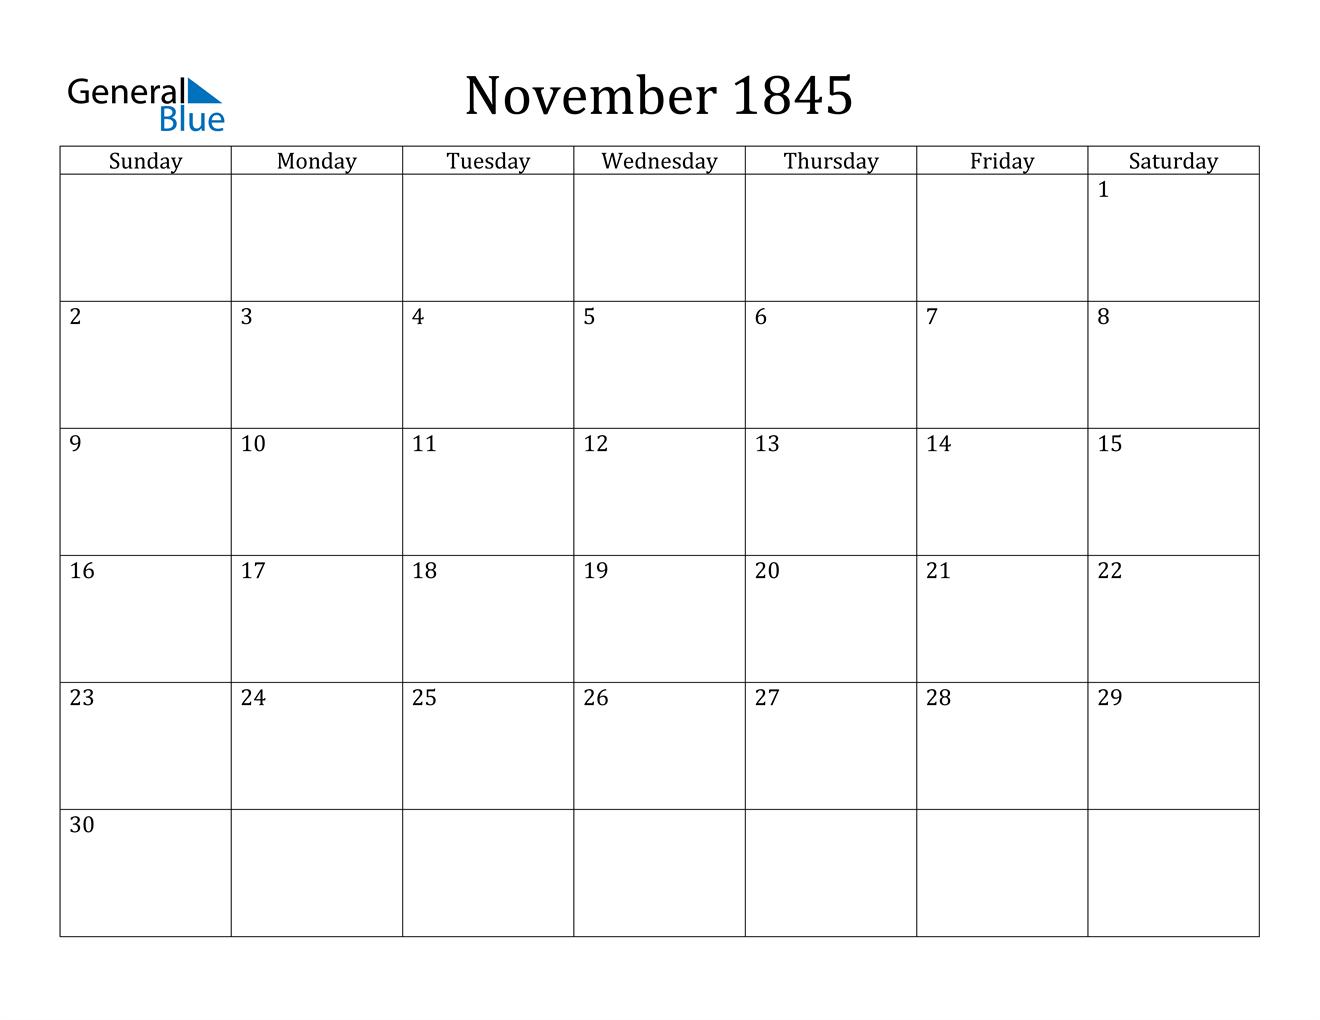 Image of November 1845 Calendar